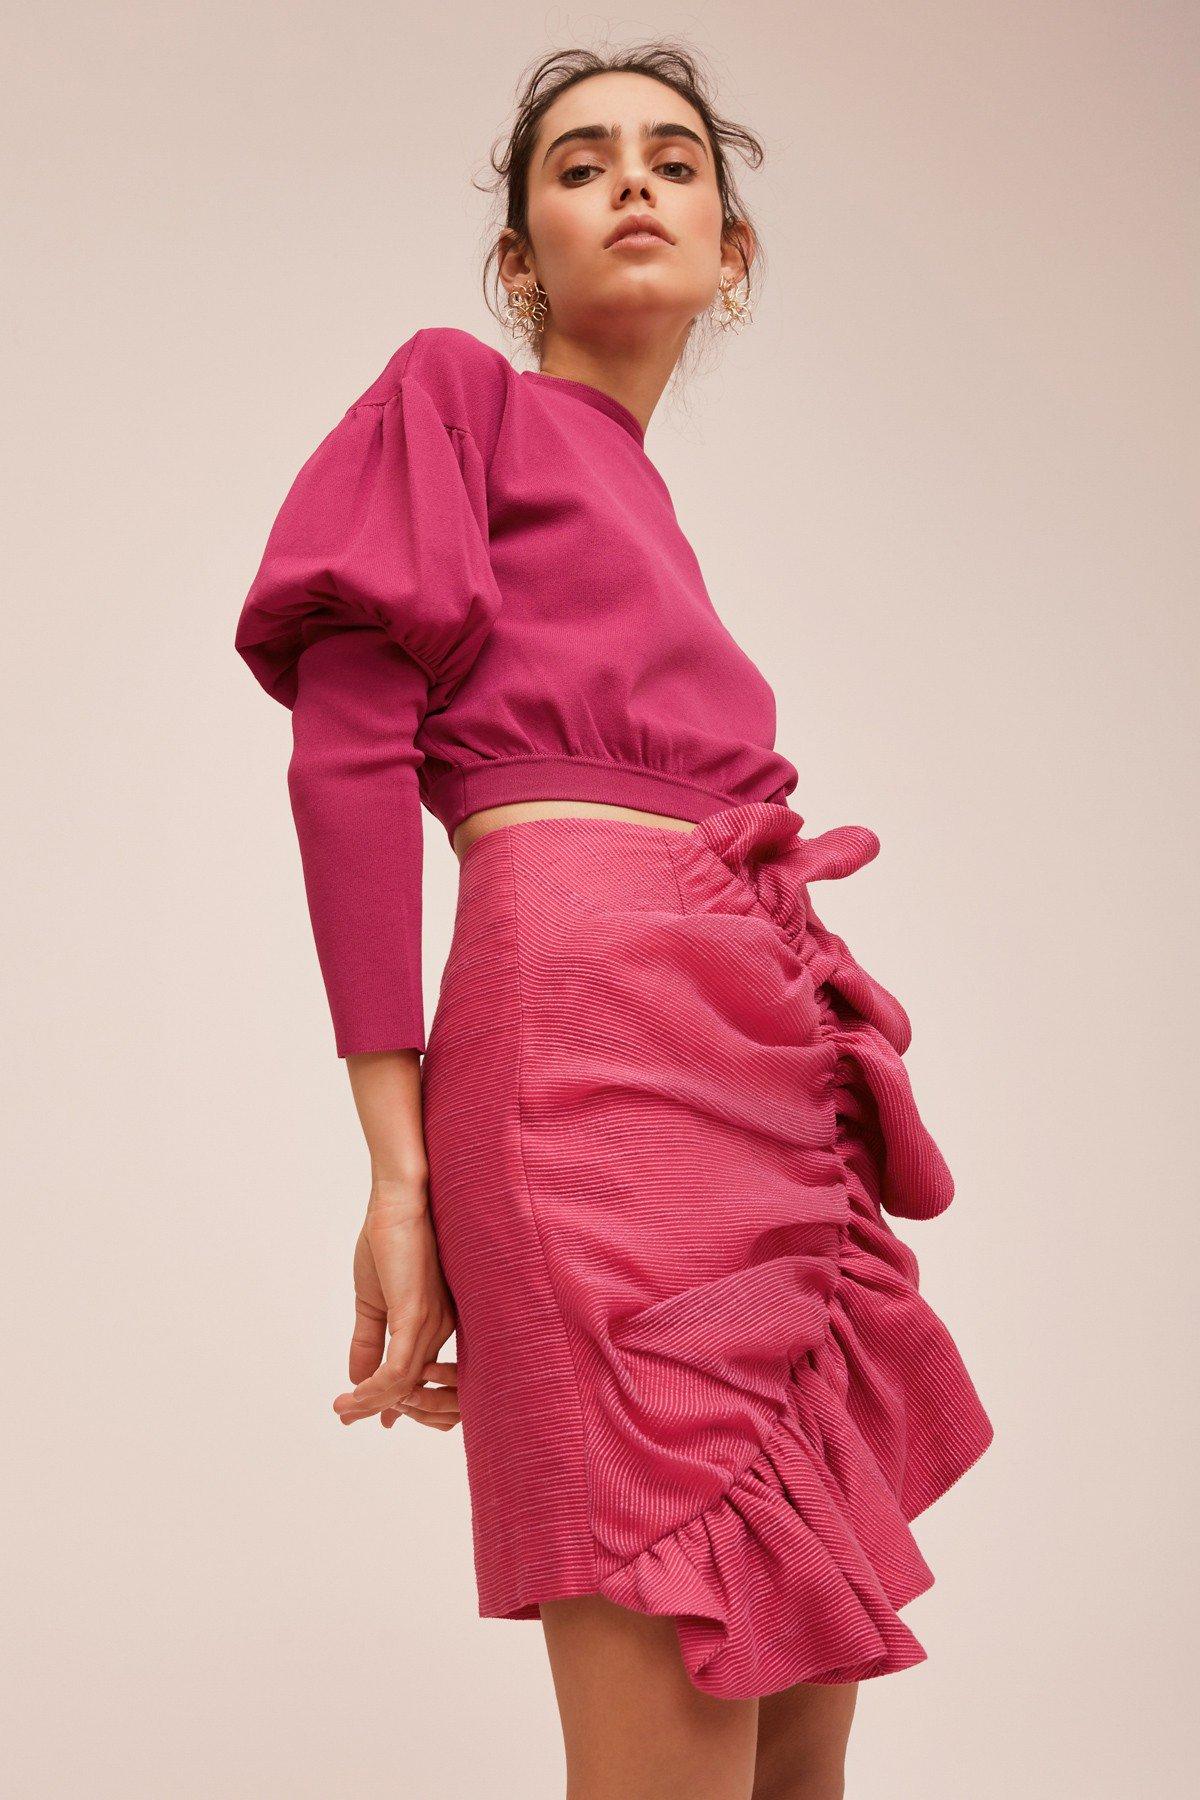 Keepsake Midnight L/S Knit Top + Only Love Skirt